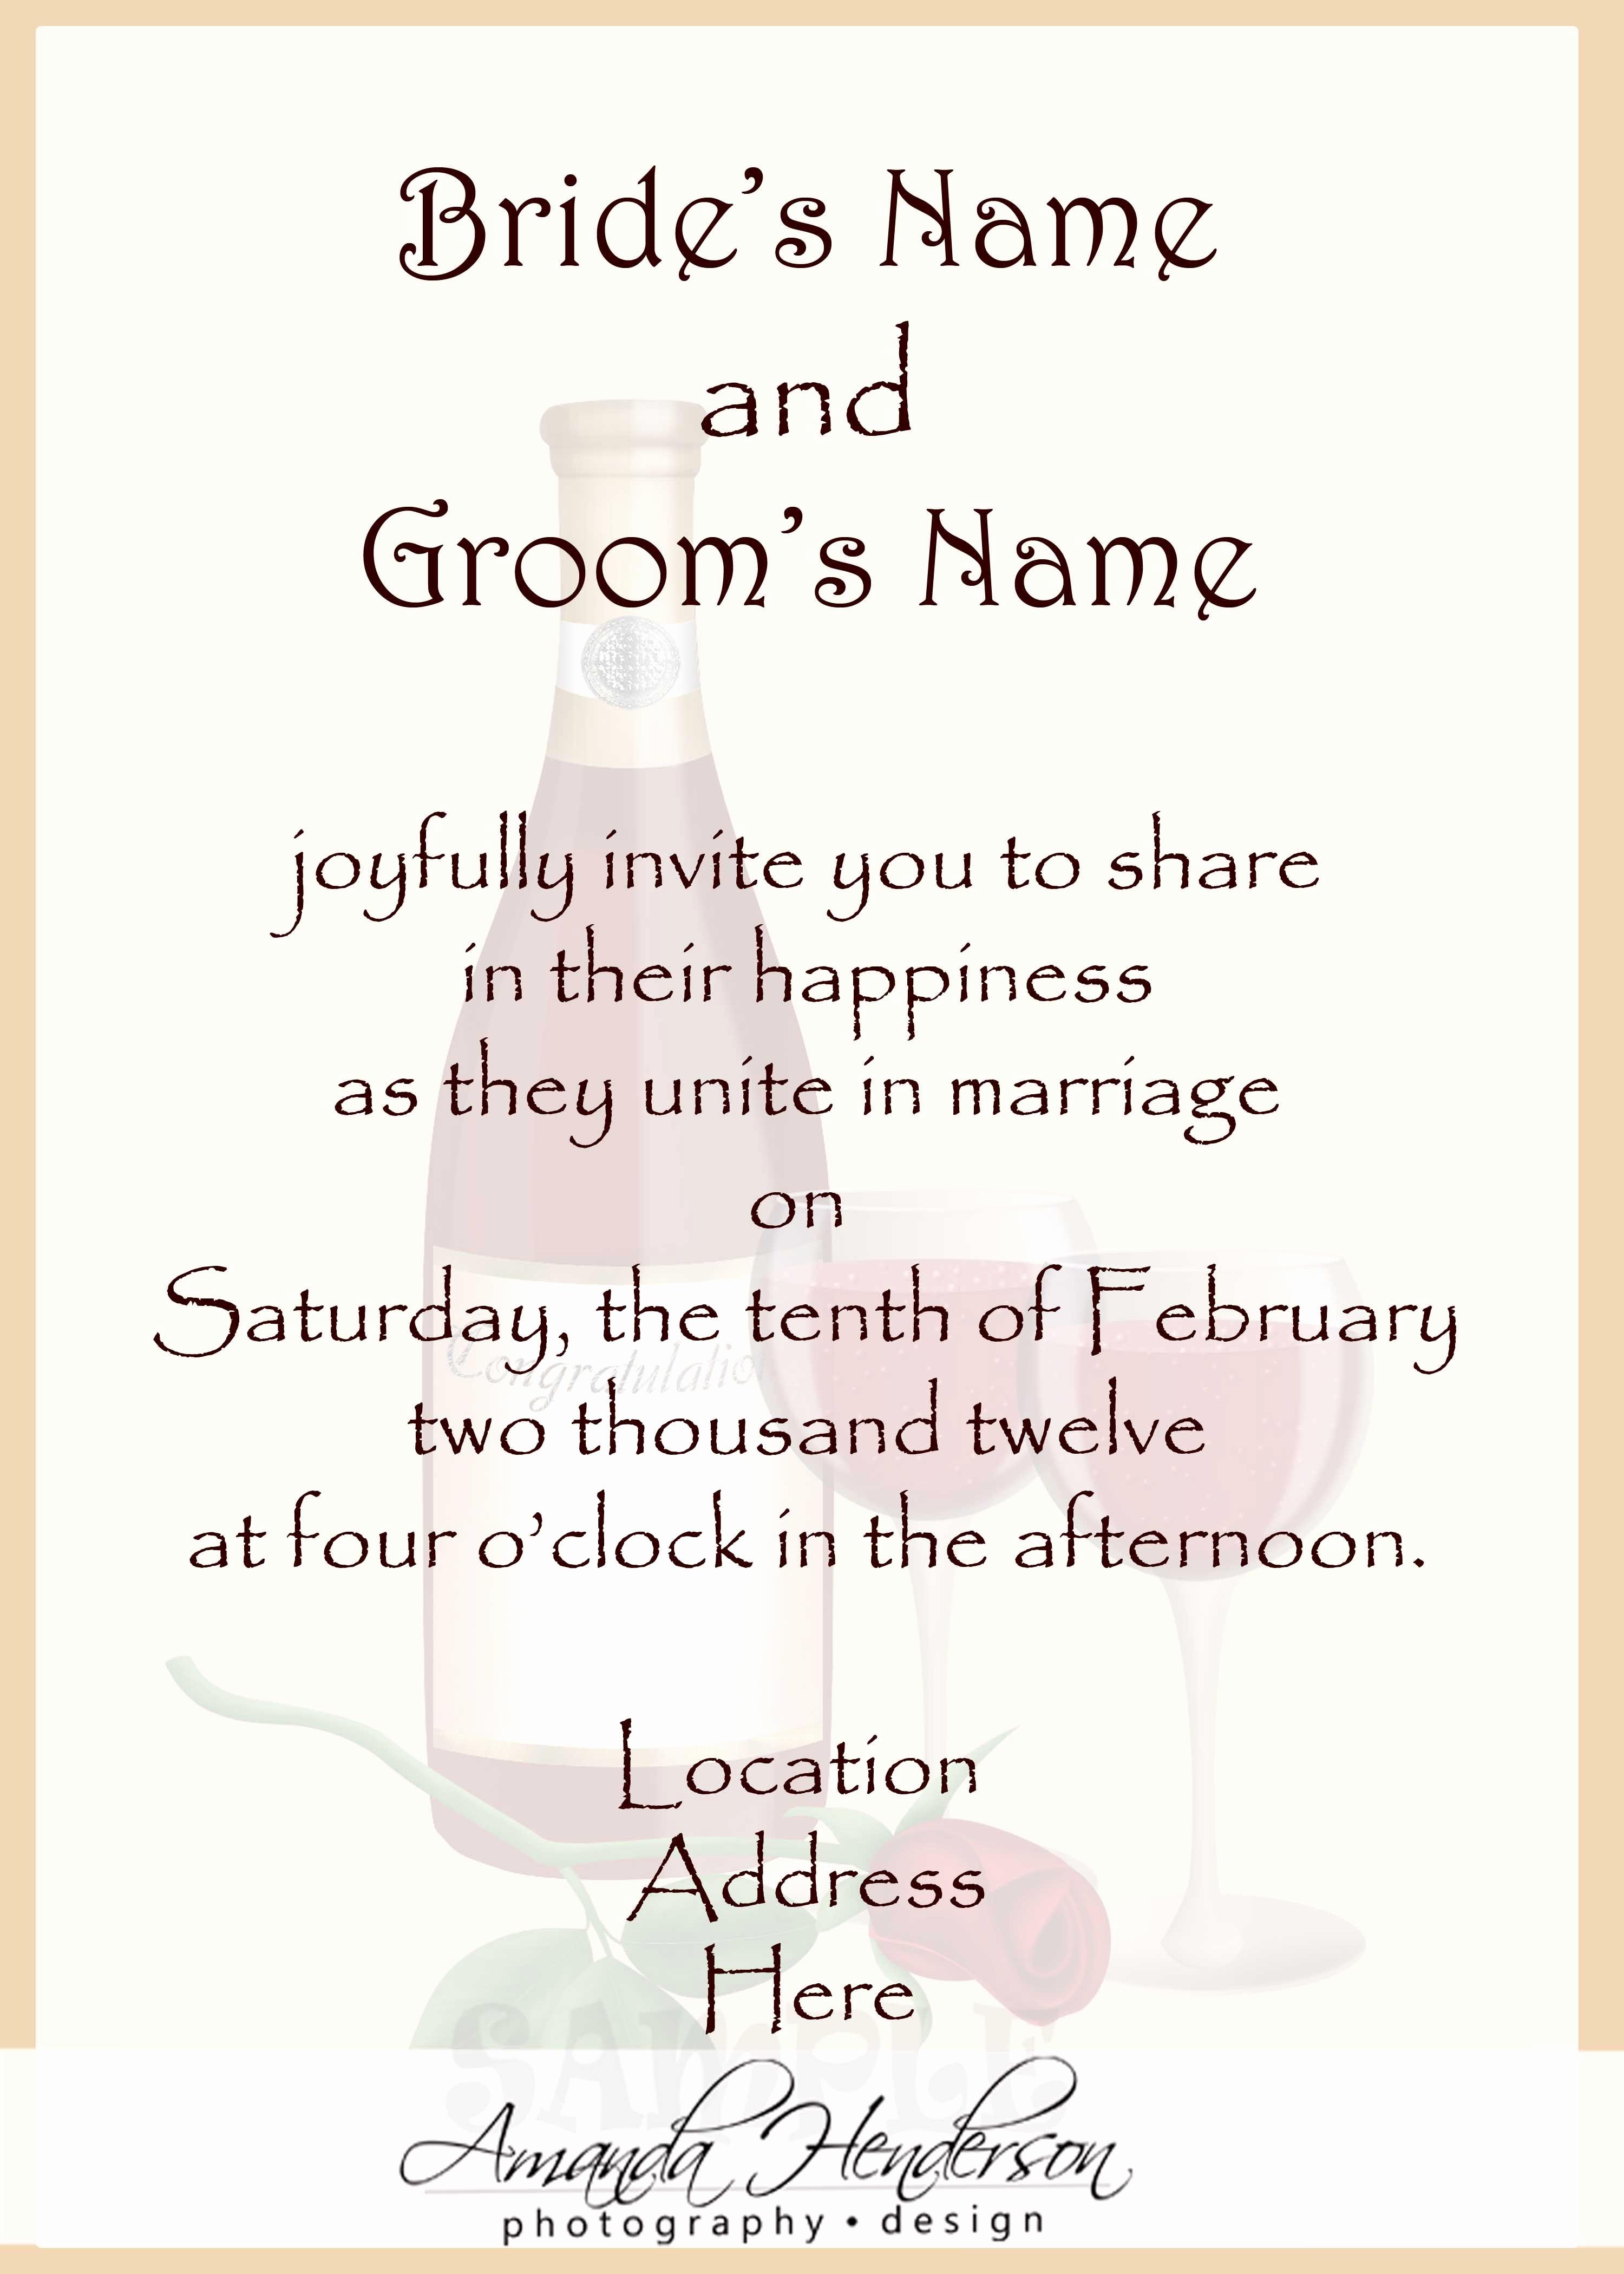 Wedding Reception Invitation Wording Samples Luxury Wedding Invitation Wording Samples